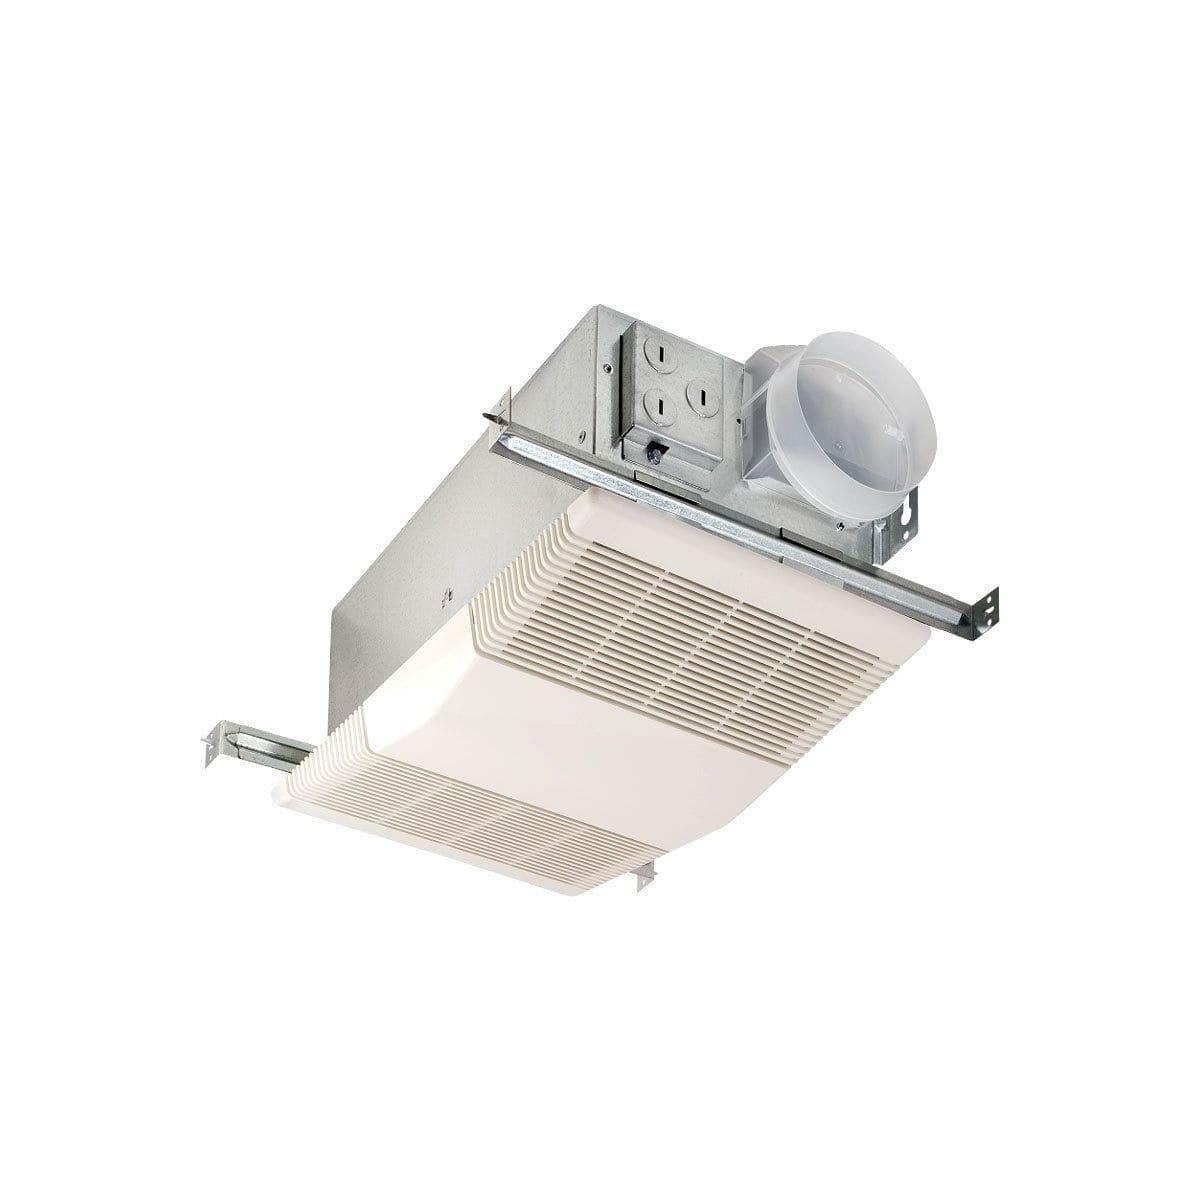 Nutone 605rp 70 Cfm 4 Sone Ceiling, Nutone Bathroom Fans